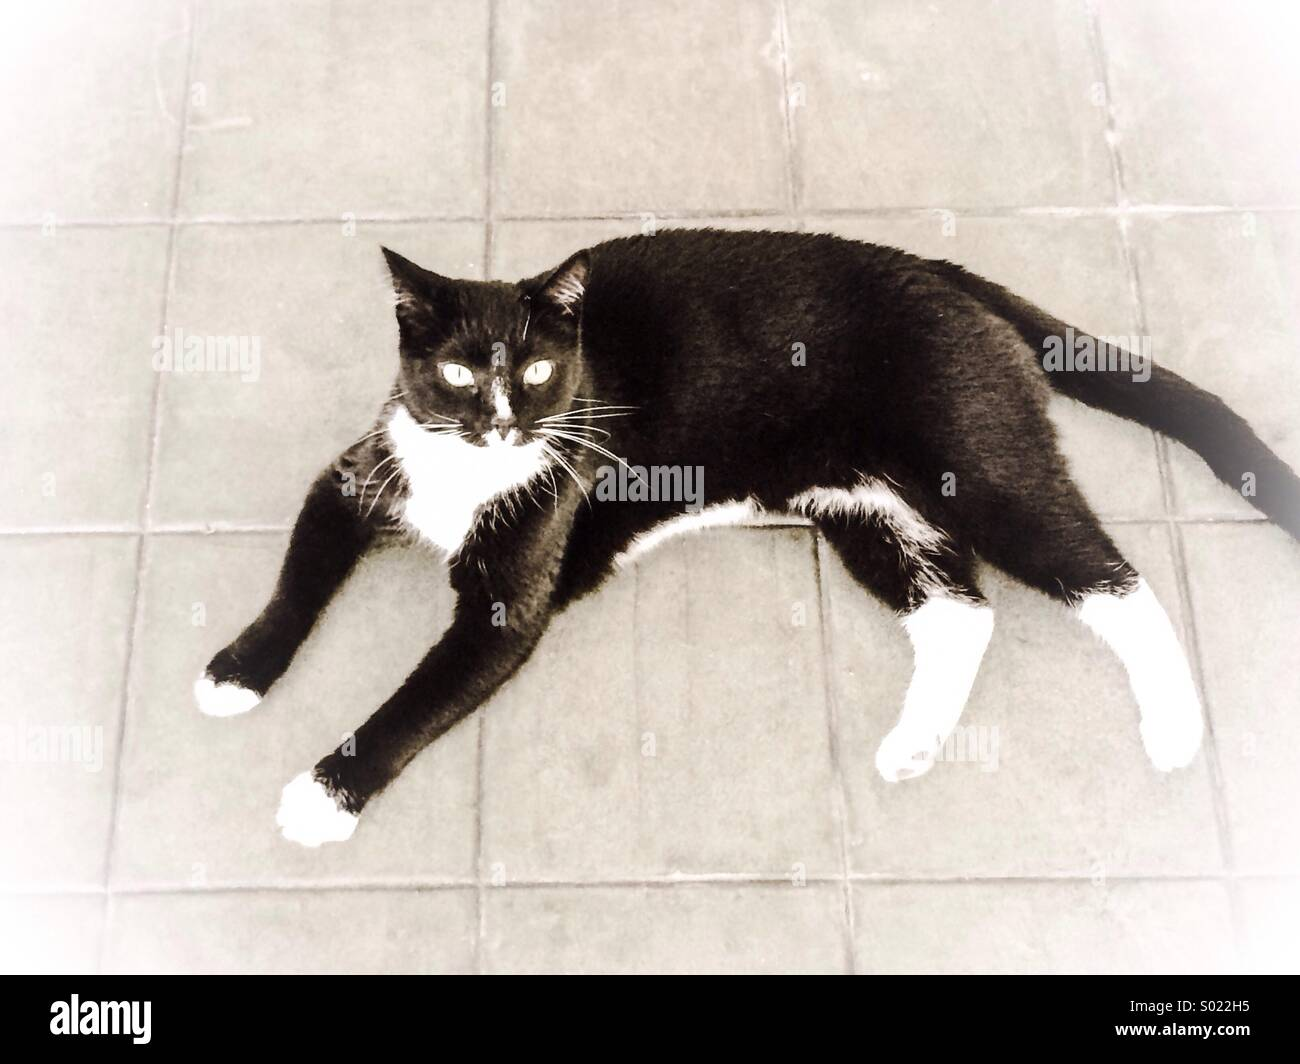 Tuxedo cat - Stock Image